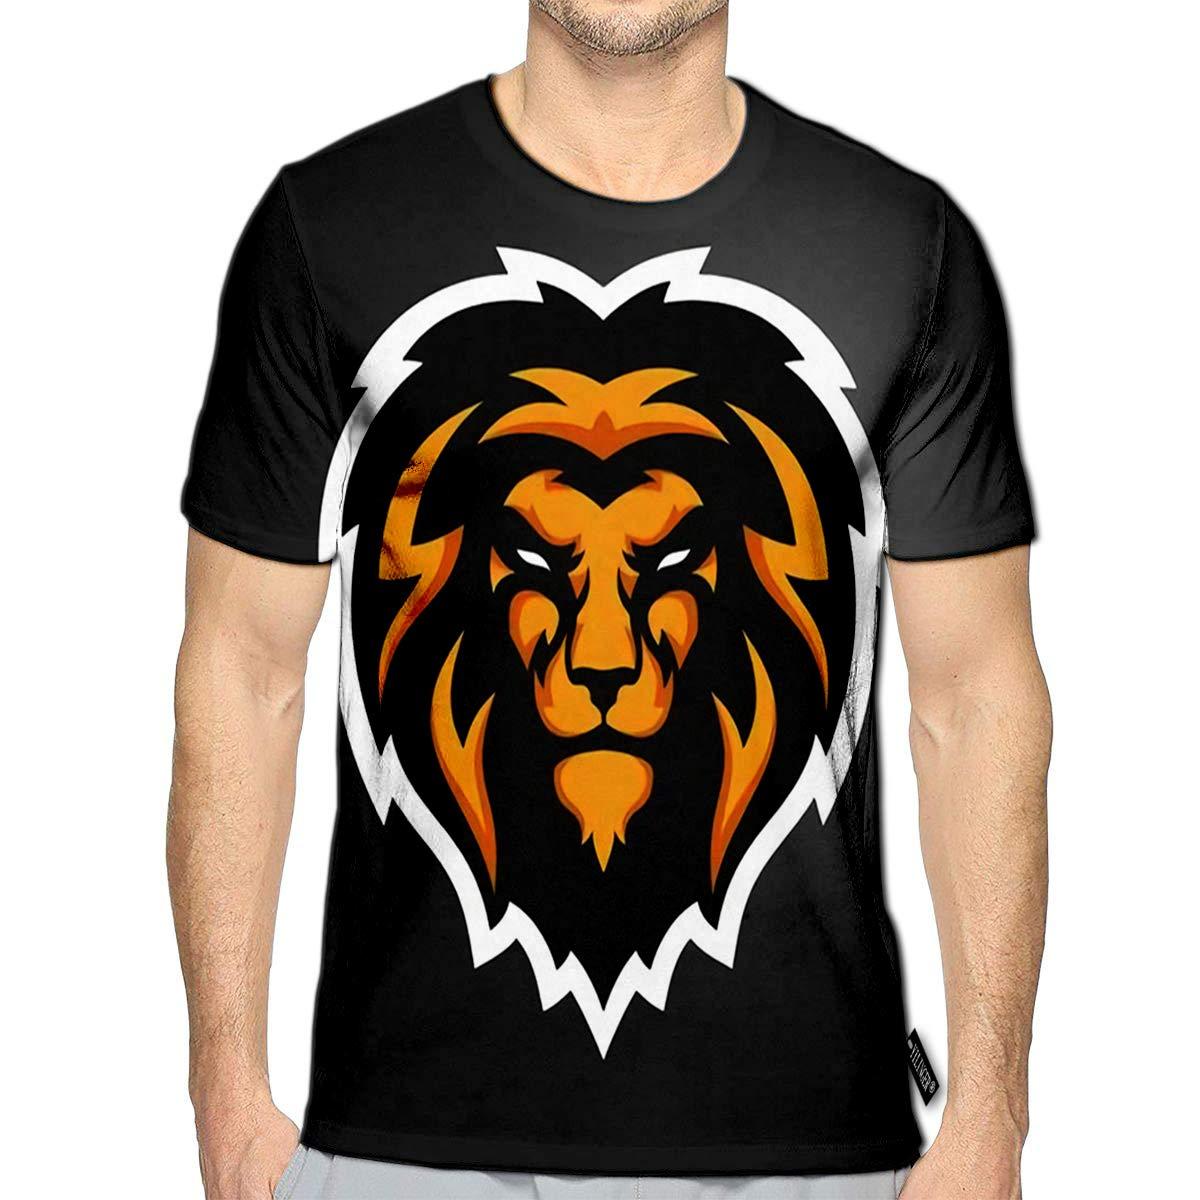 3D Printed T Shirts Zodiac Sign Aquarius Beautiful Girl Horoscope Astrology Casual Mens Hipster Top Tees